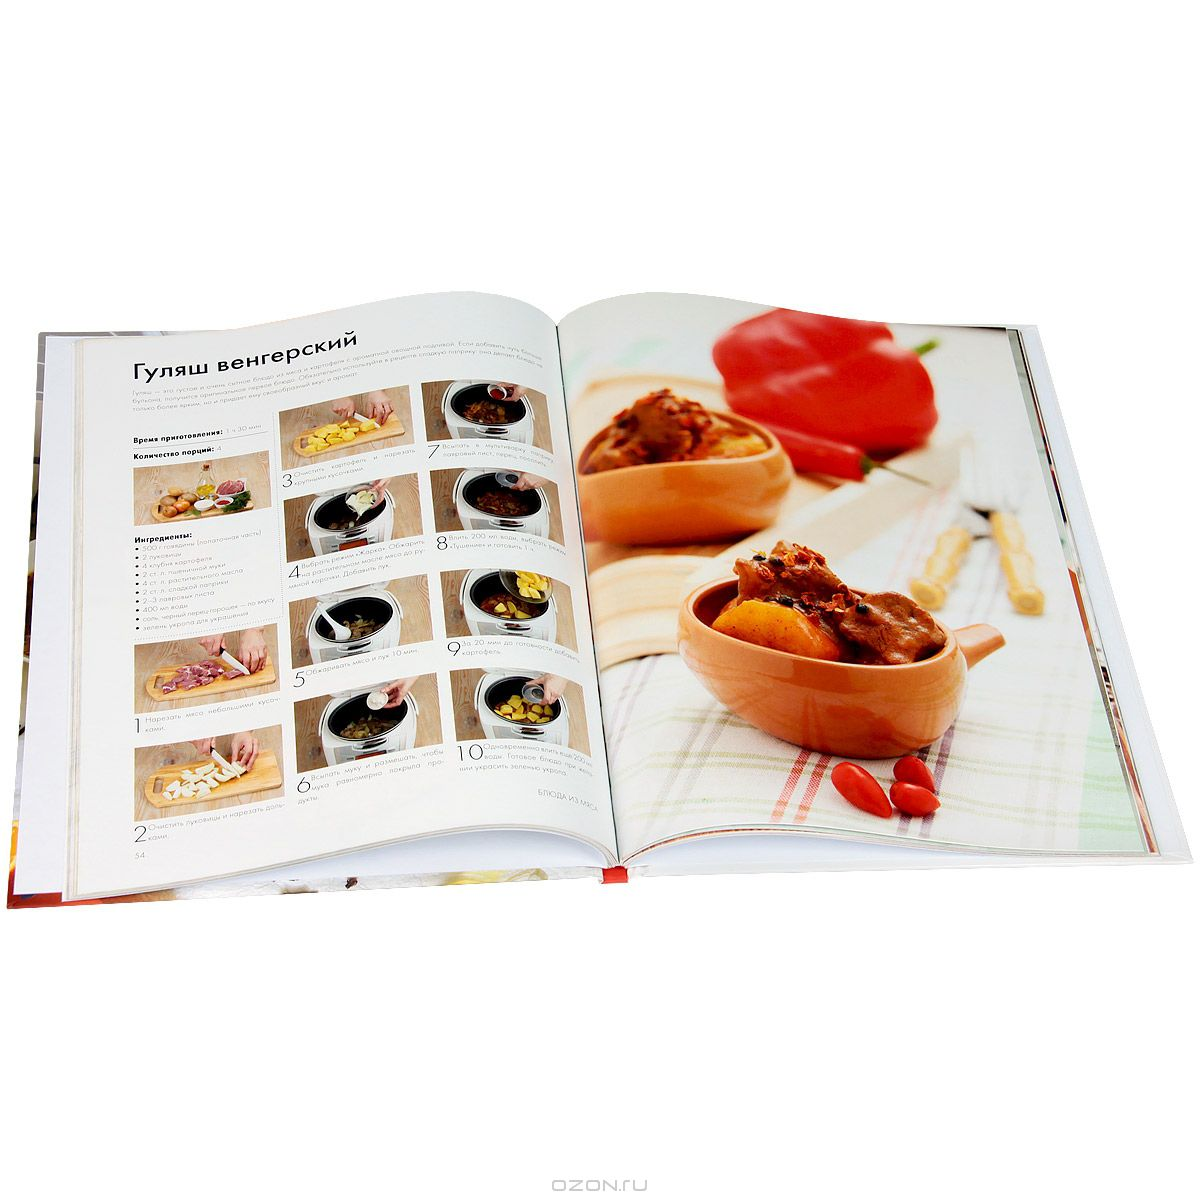 книга рецептов к мультиварке поларис рмс 0517 ад